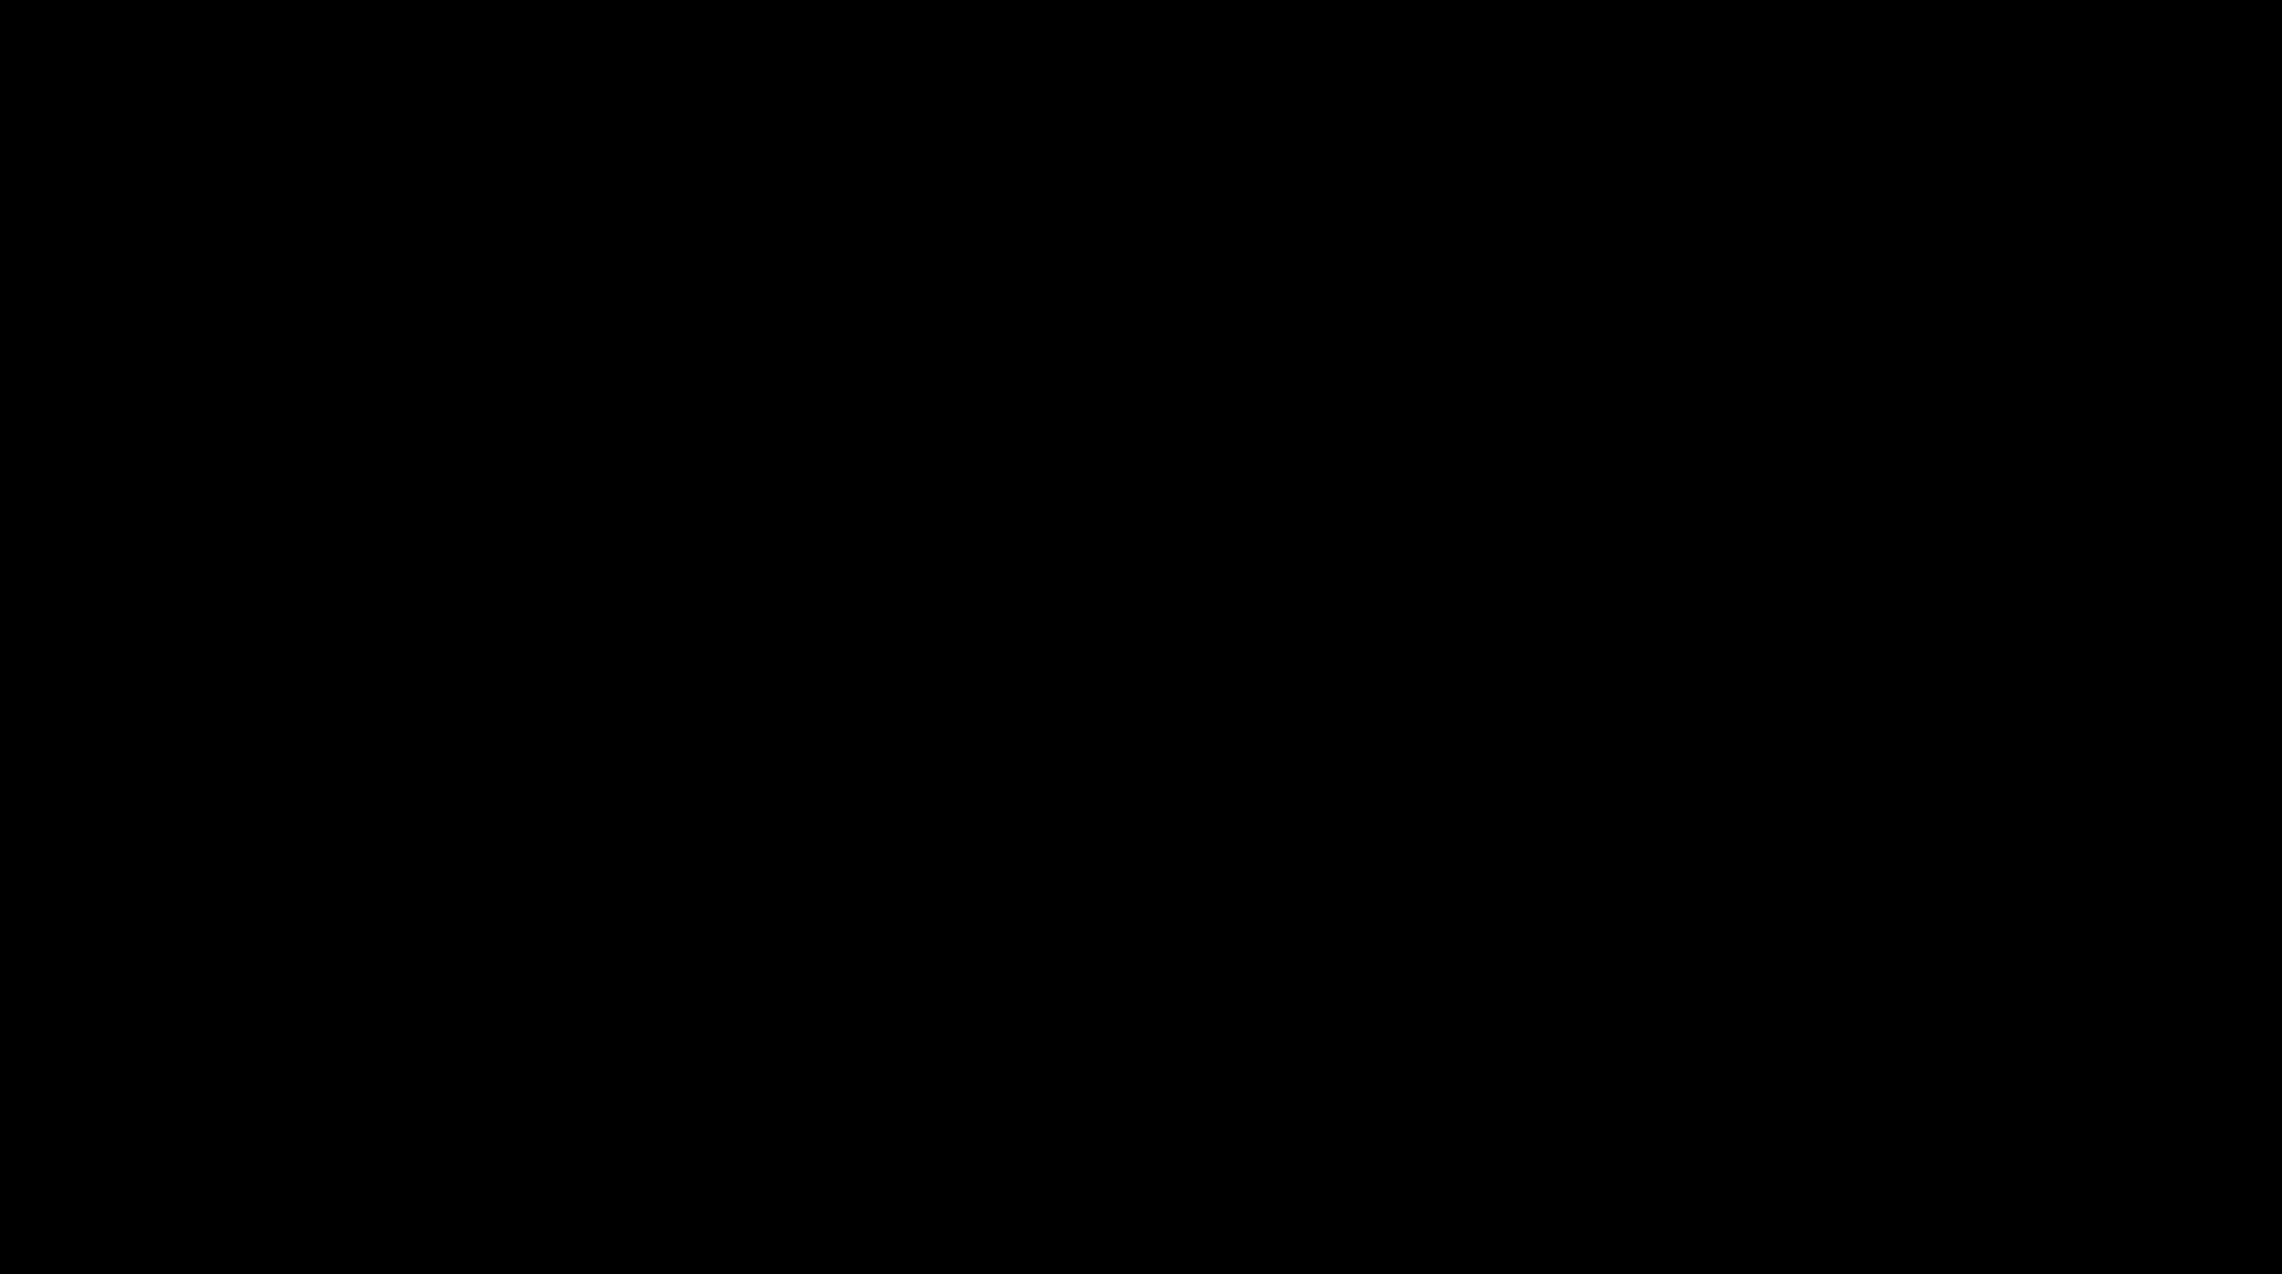 Clipart - Rhinoceros Silhouette